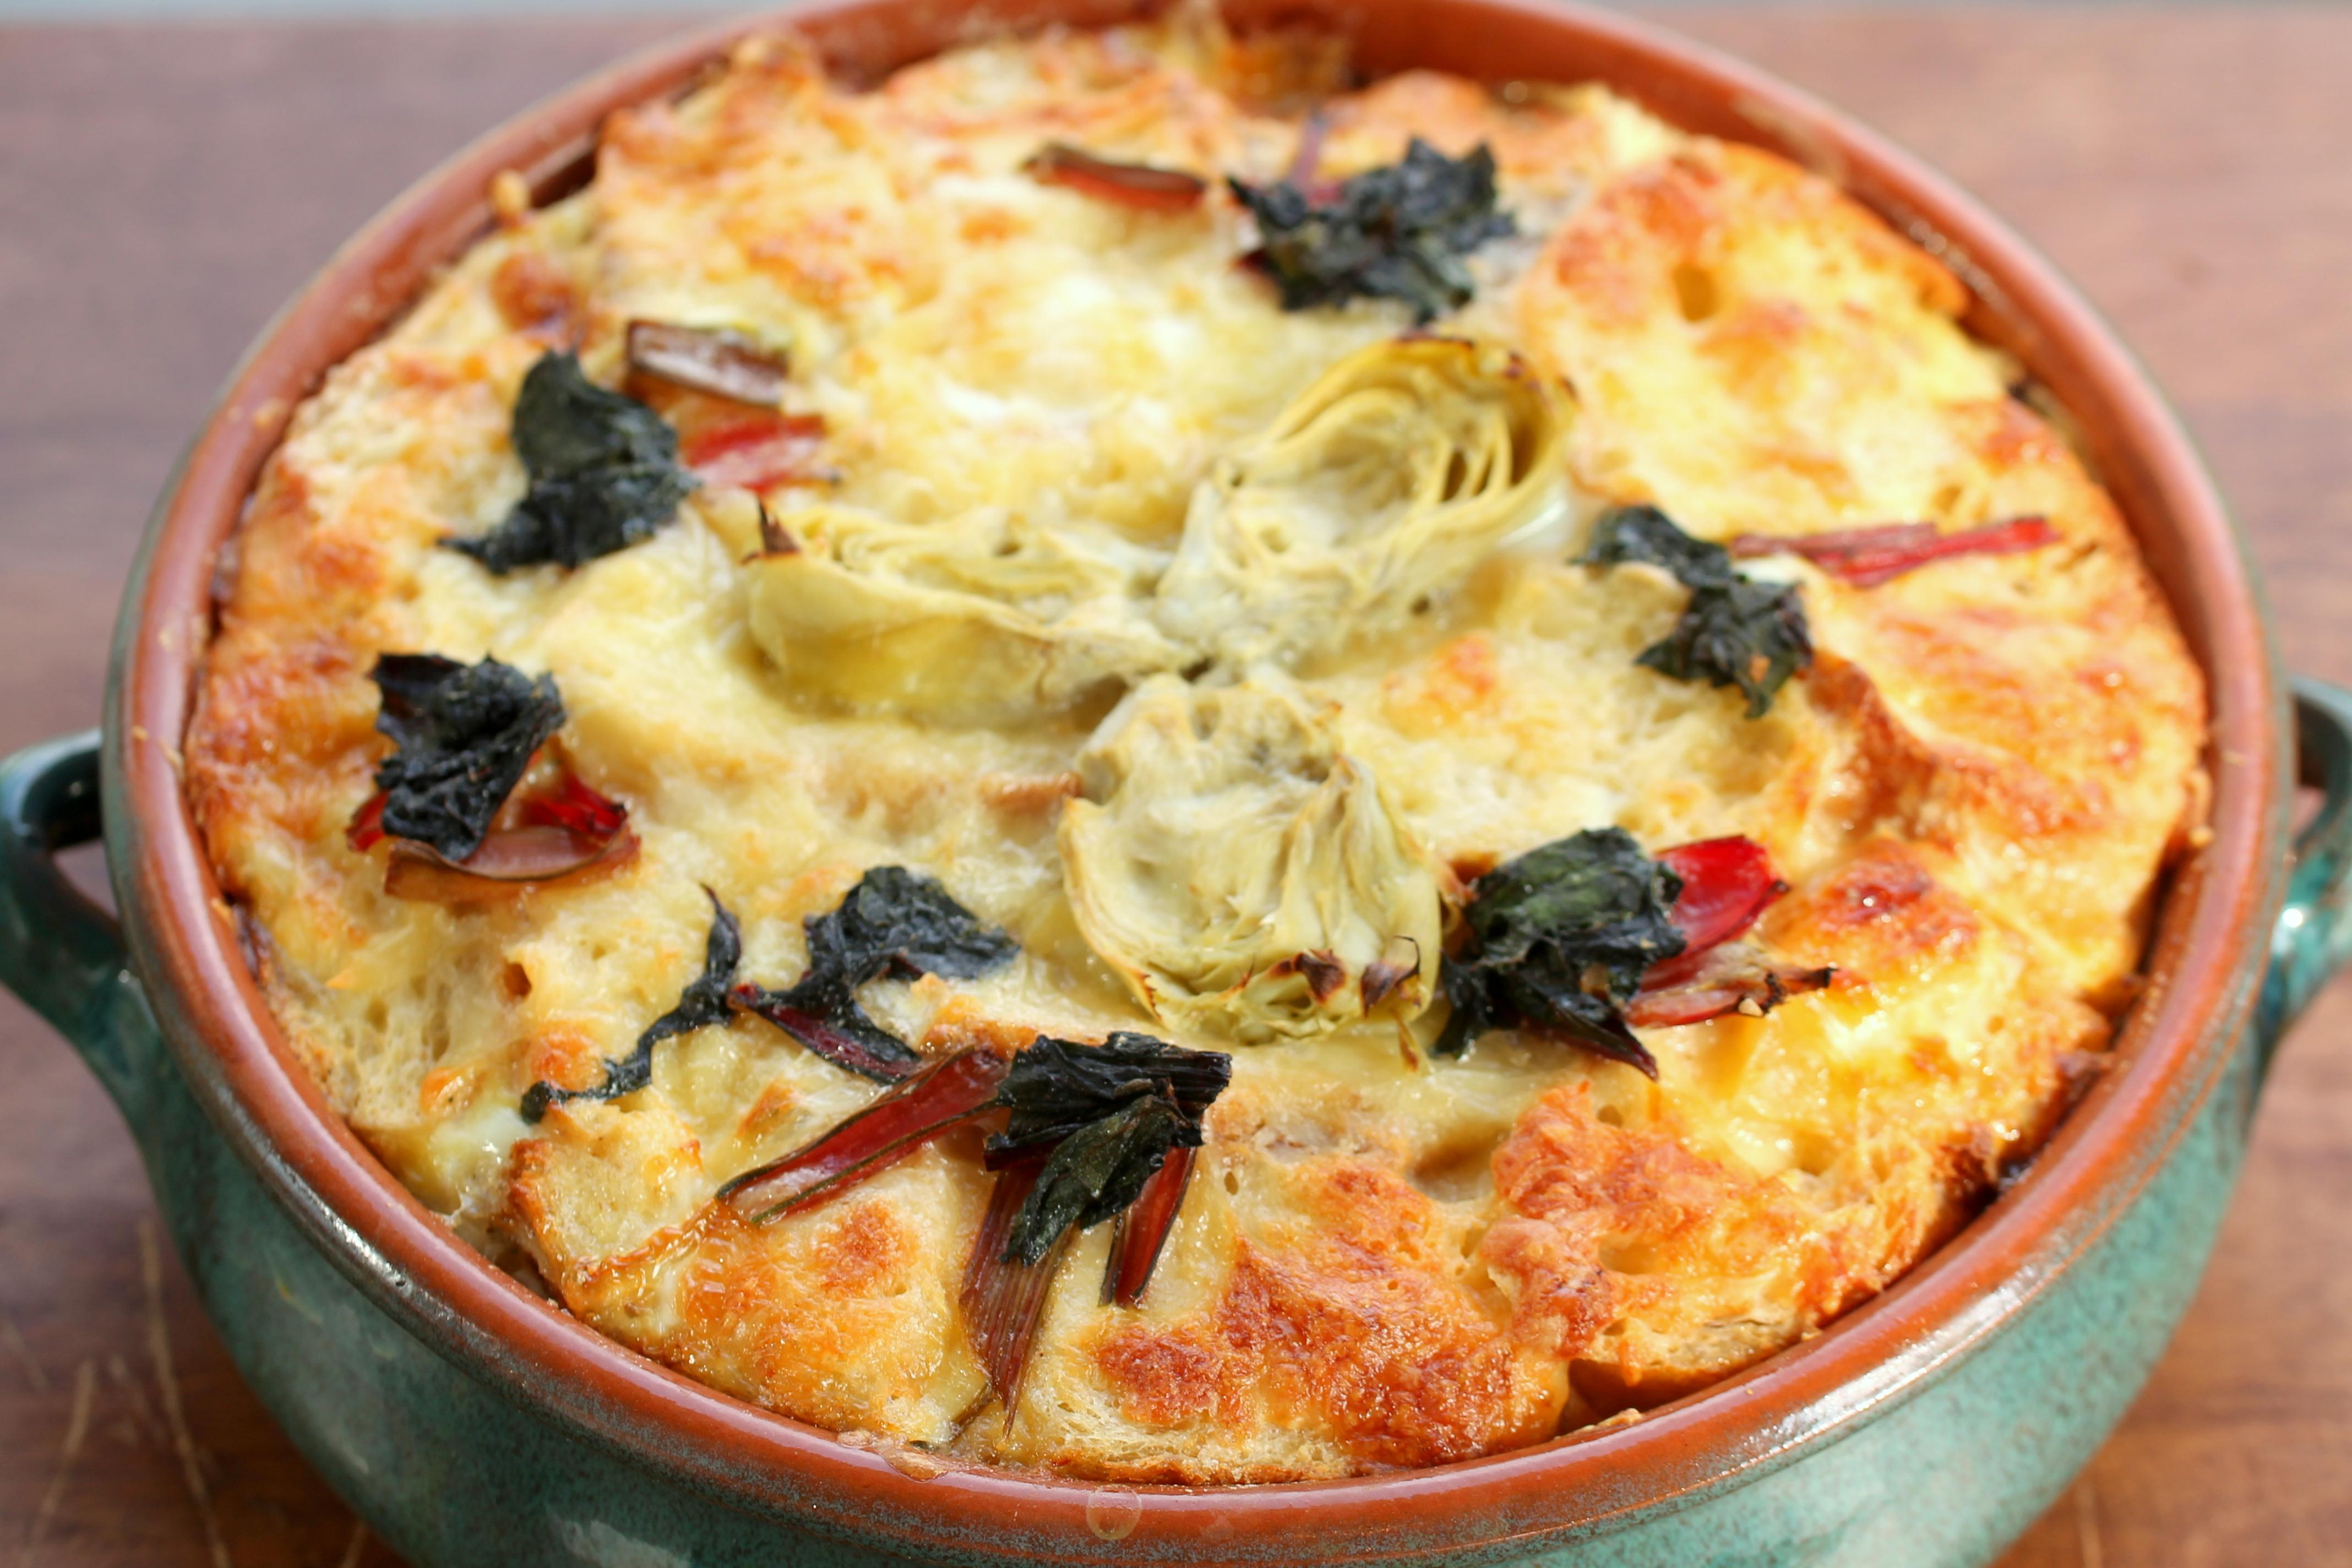 Savory Bread Pudding, Artichoke, Swiss Chard, (Milk,Butter,Cheese) It's National Dairy Month